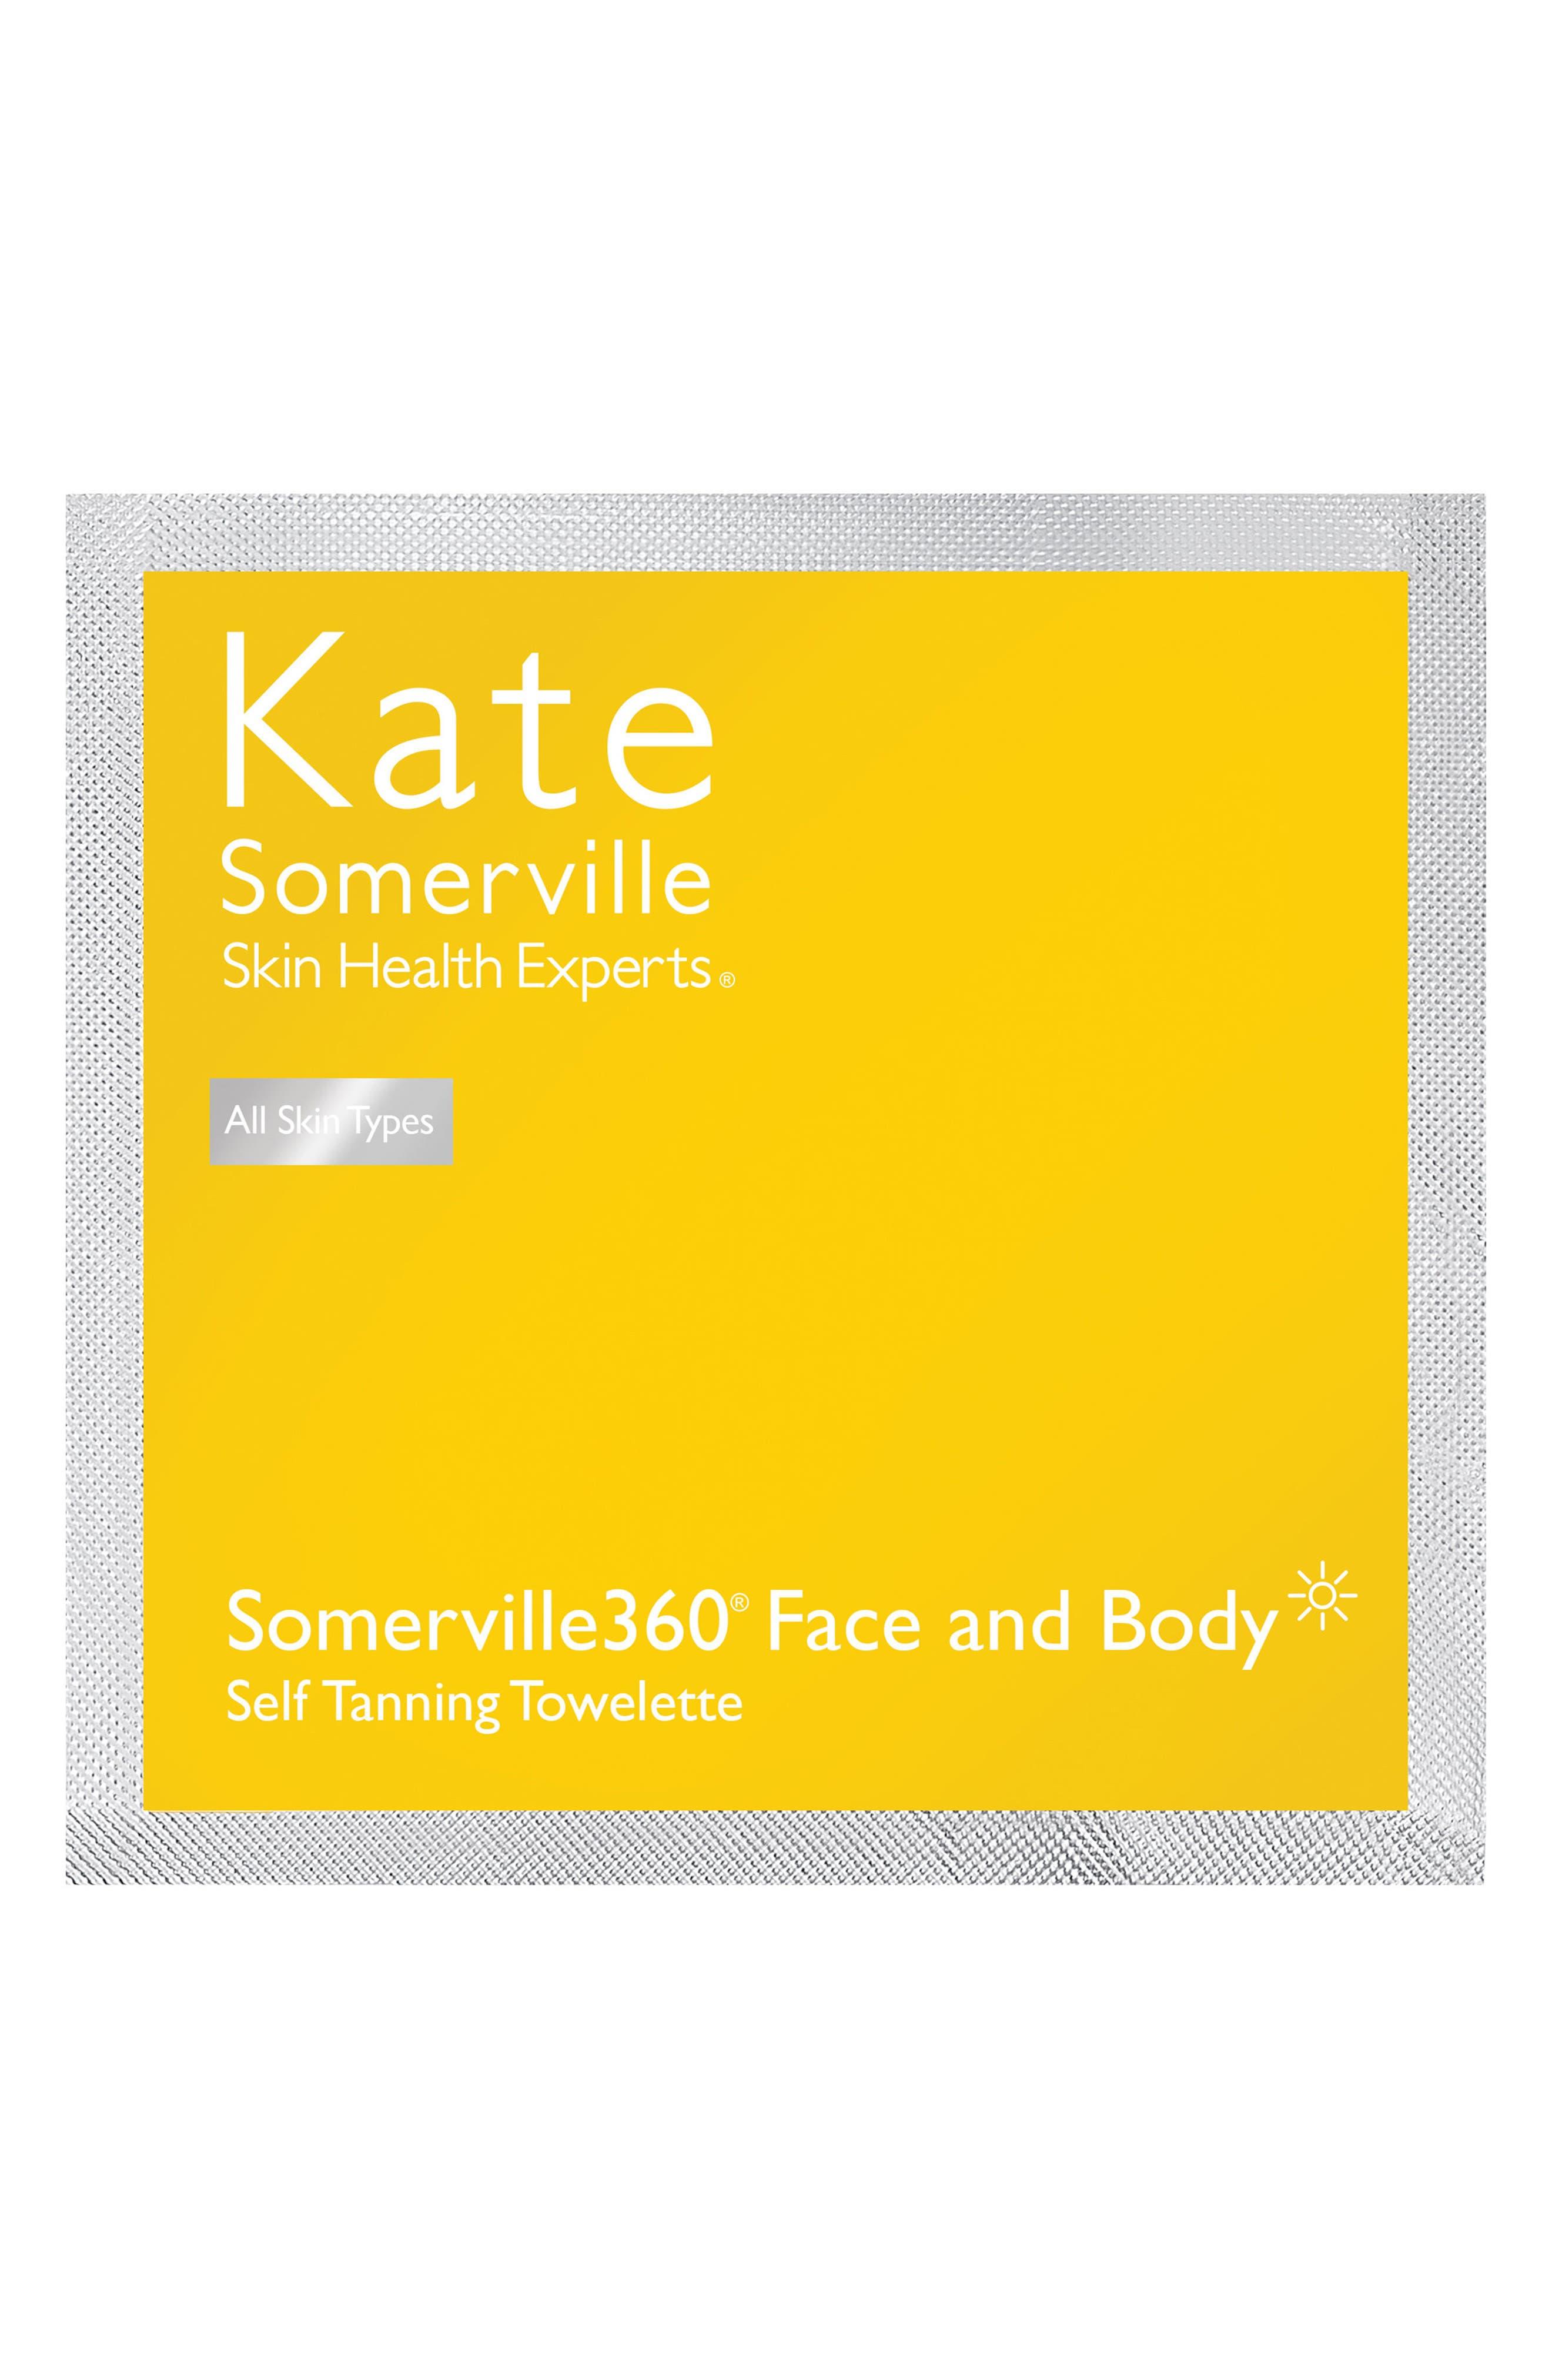 Kate Somerville® 'Somerville360°' Tanning Towelettes